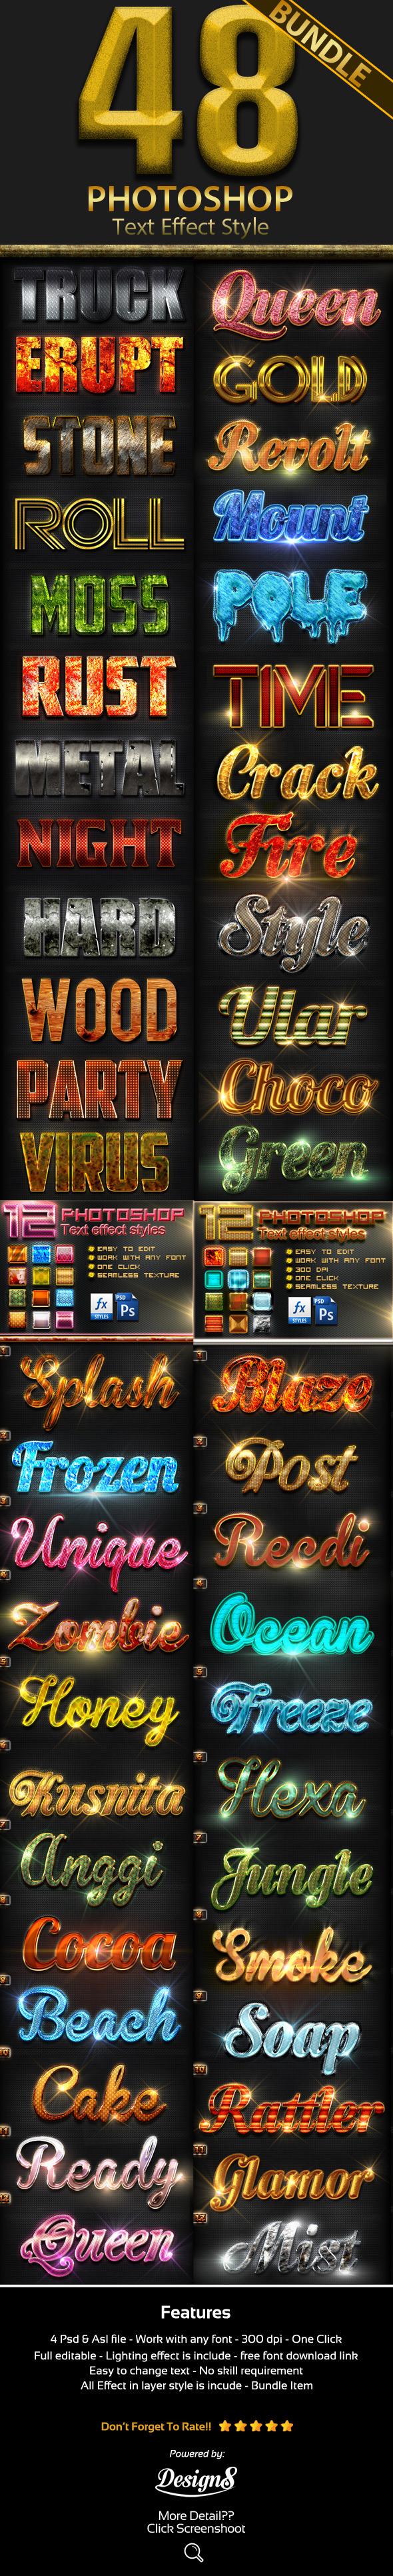 48 Photoshop Style Bundle Part 1 - Text Effects Styles